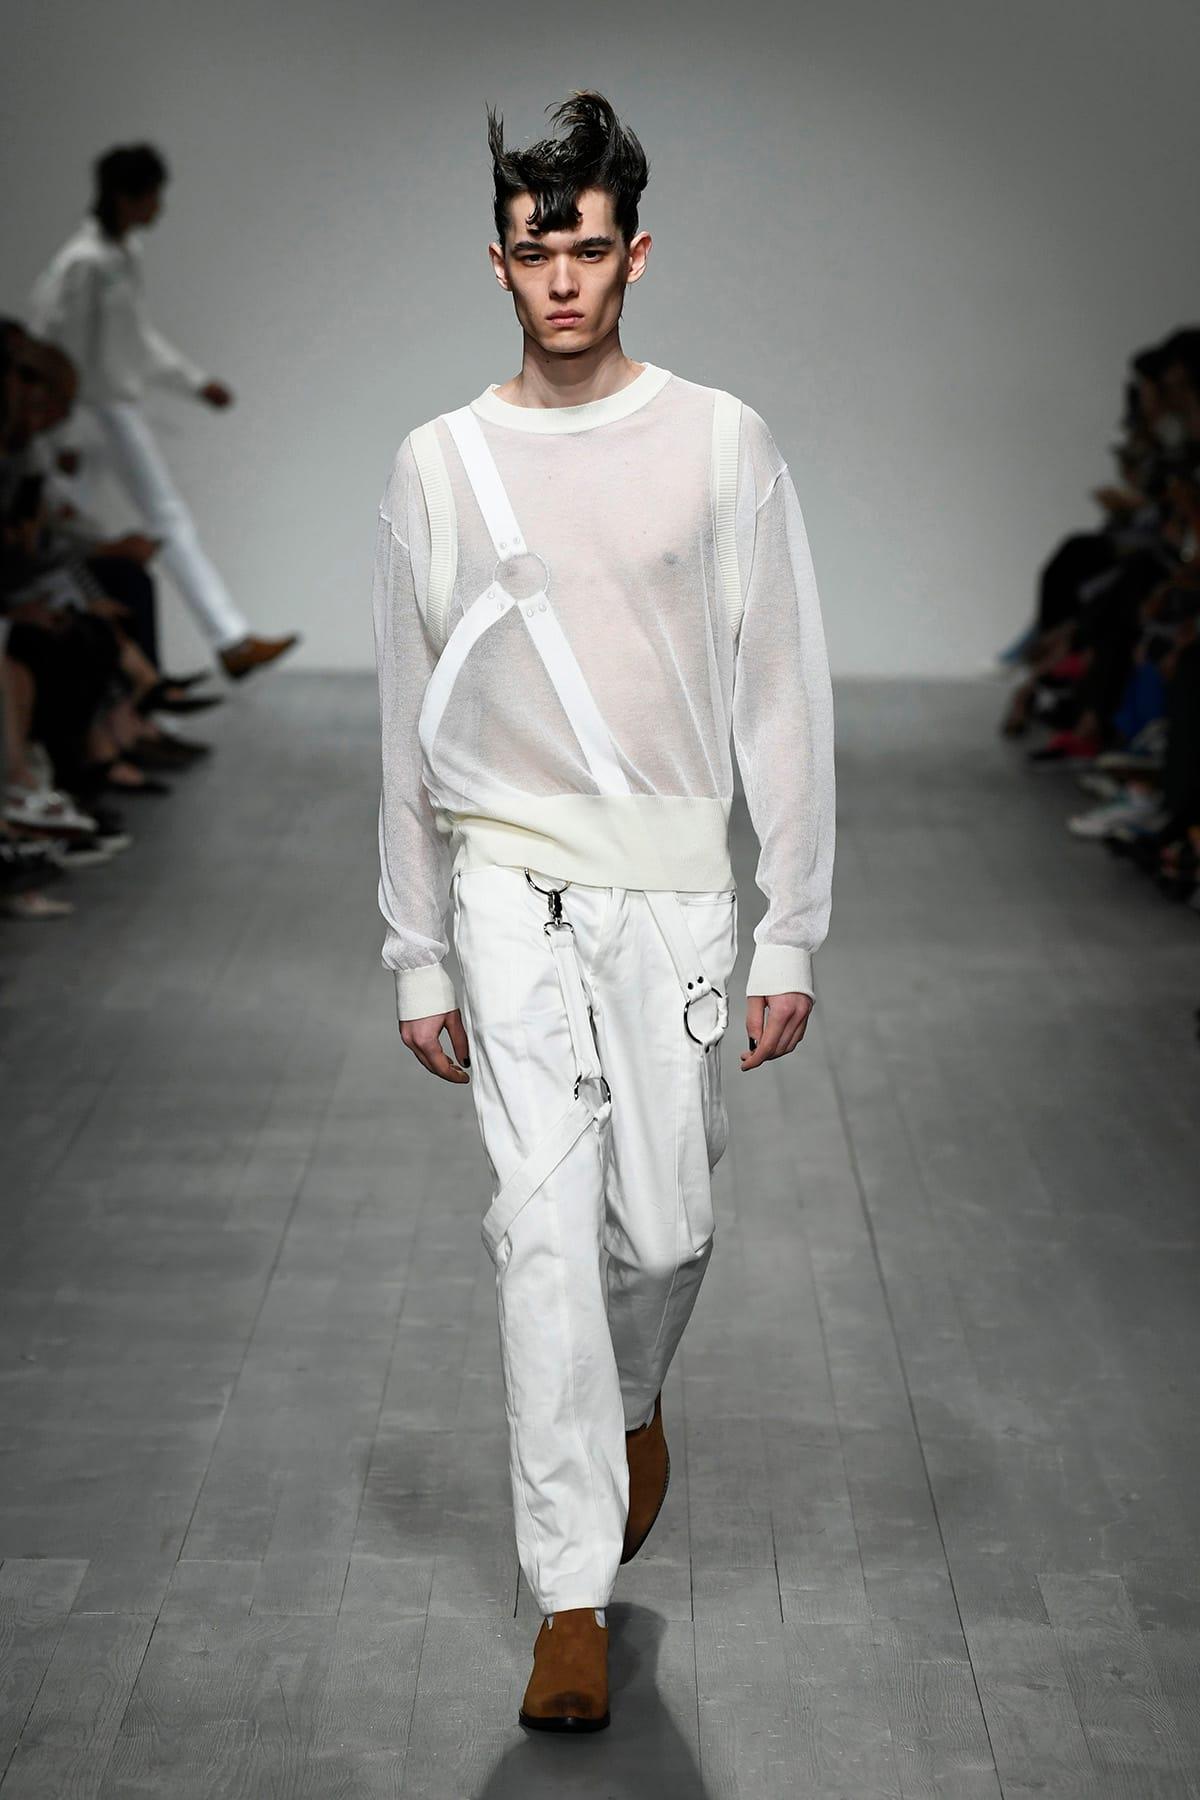 Asian Men S Fashion 2019 , In Fashion Famous